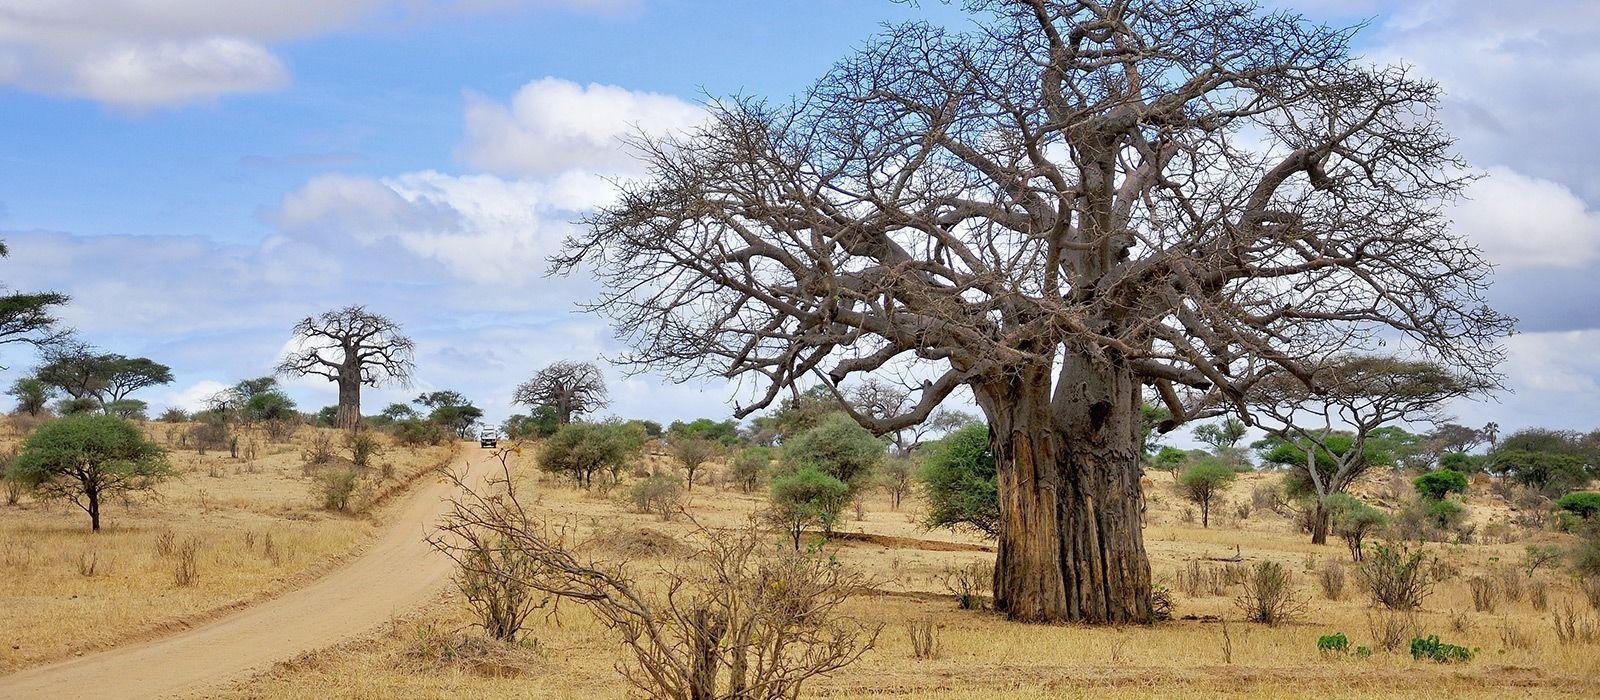 Destination Katavi Tanzania